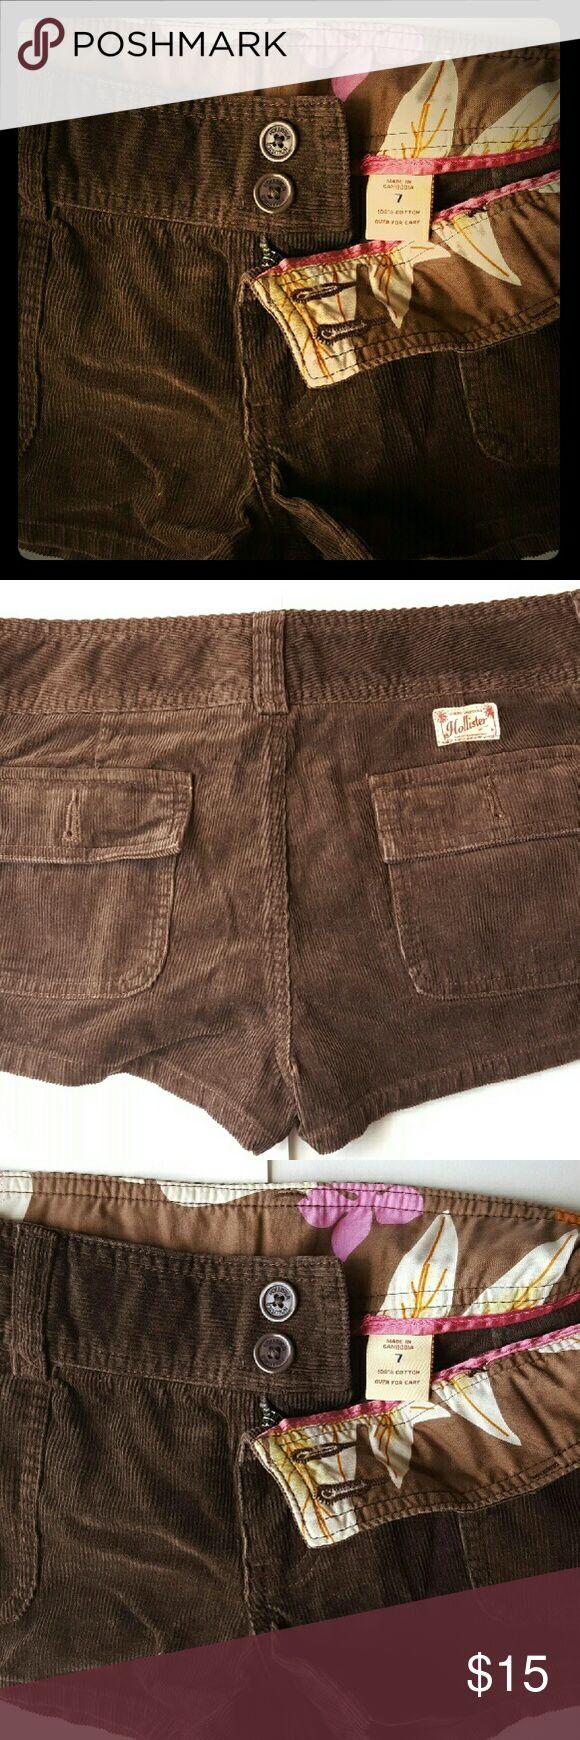 Selling this NWOT Hollister Drk. Brown Corduroy Shorts on Poshmark! My username is: kloglesby. #shopmycloset #poshmark #fashion #shopping #style #forsale #Hollister #Pants